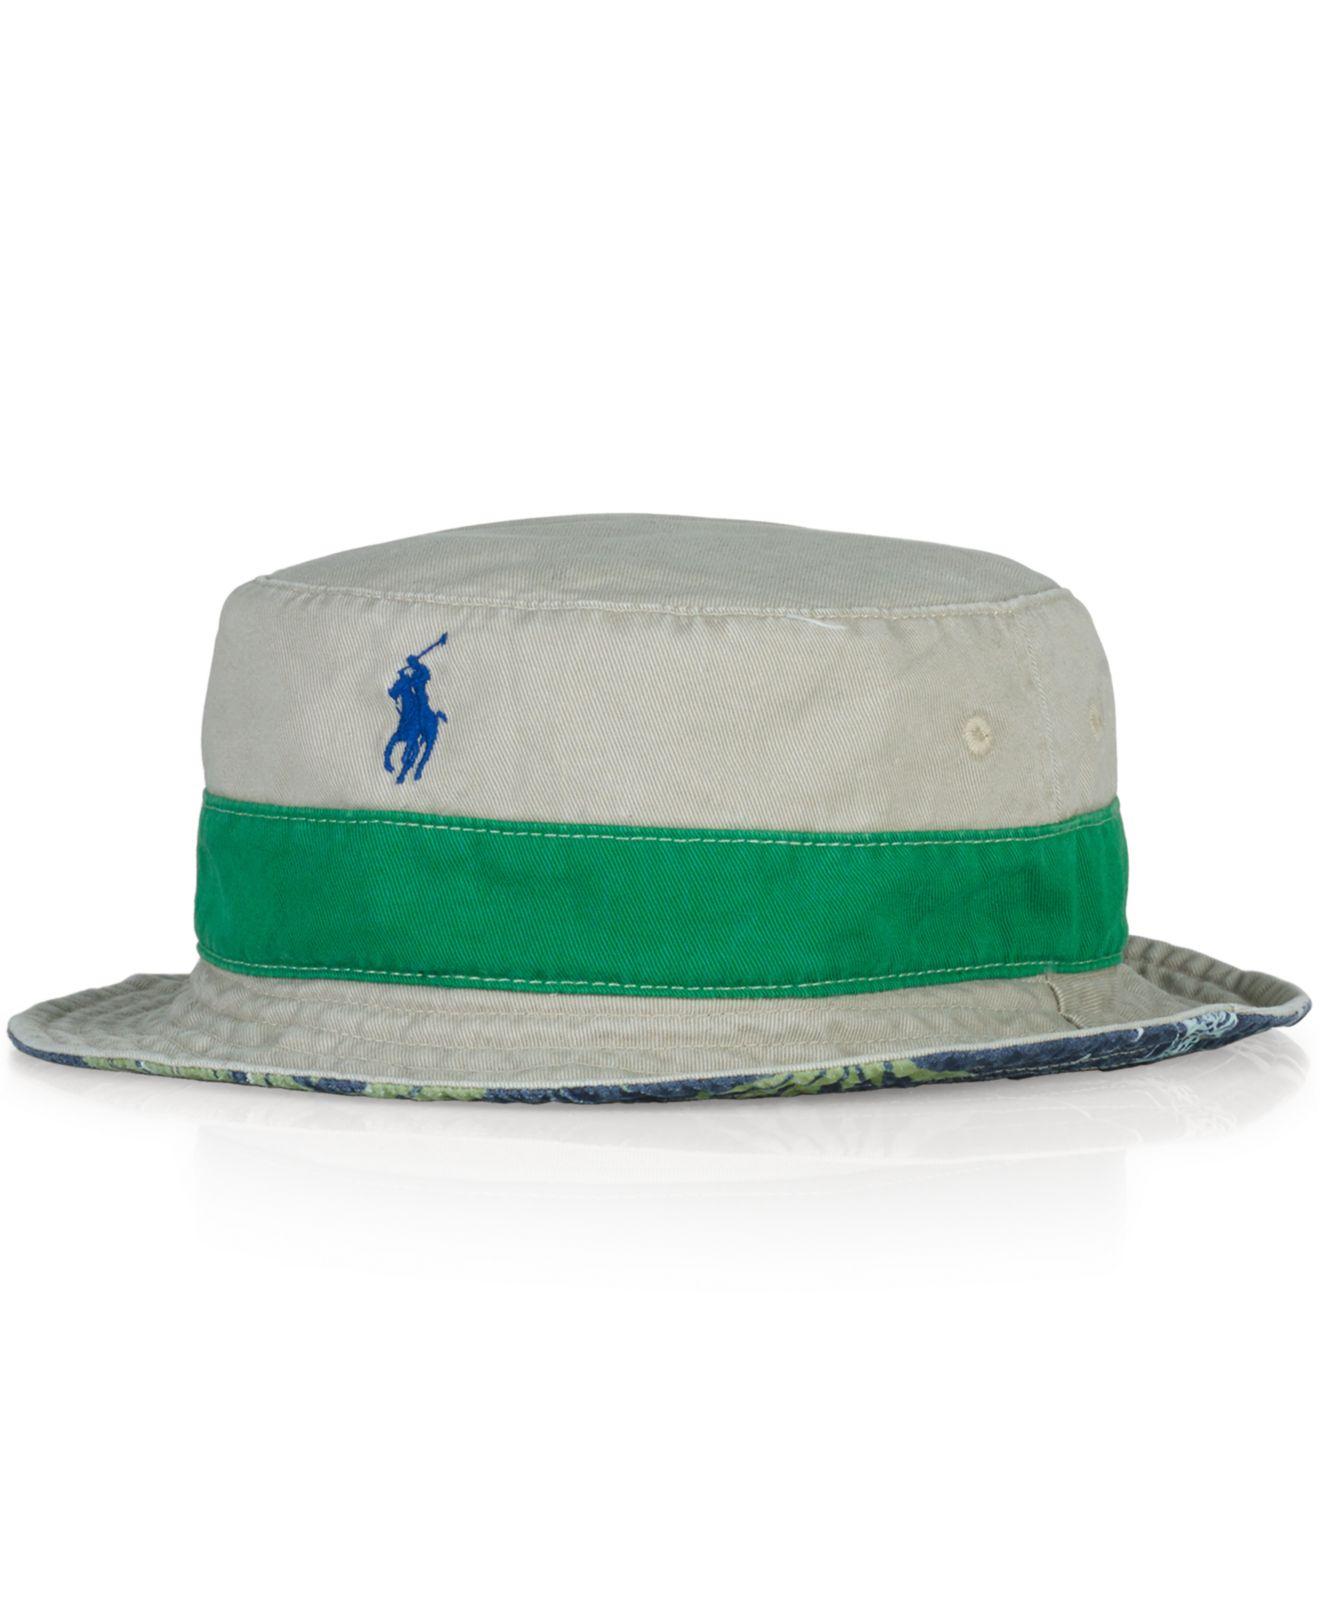 Lyst - Polo Ralph Lauren Reversible Tropical Bucket Hat for Men 684d9619512a